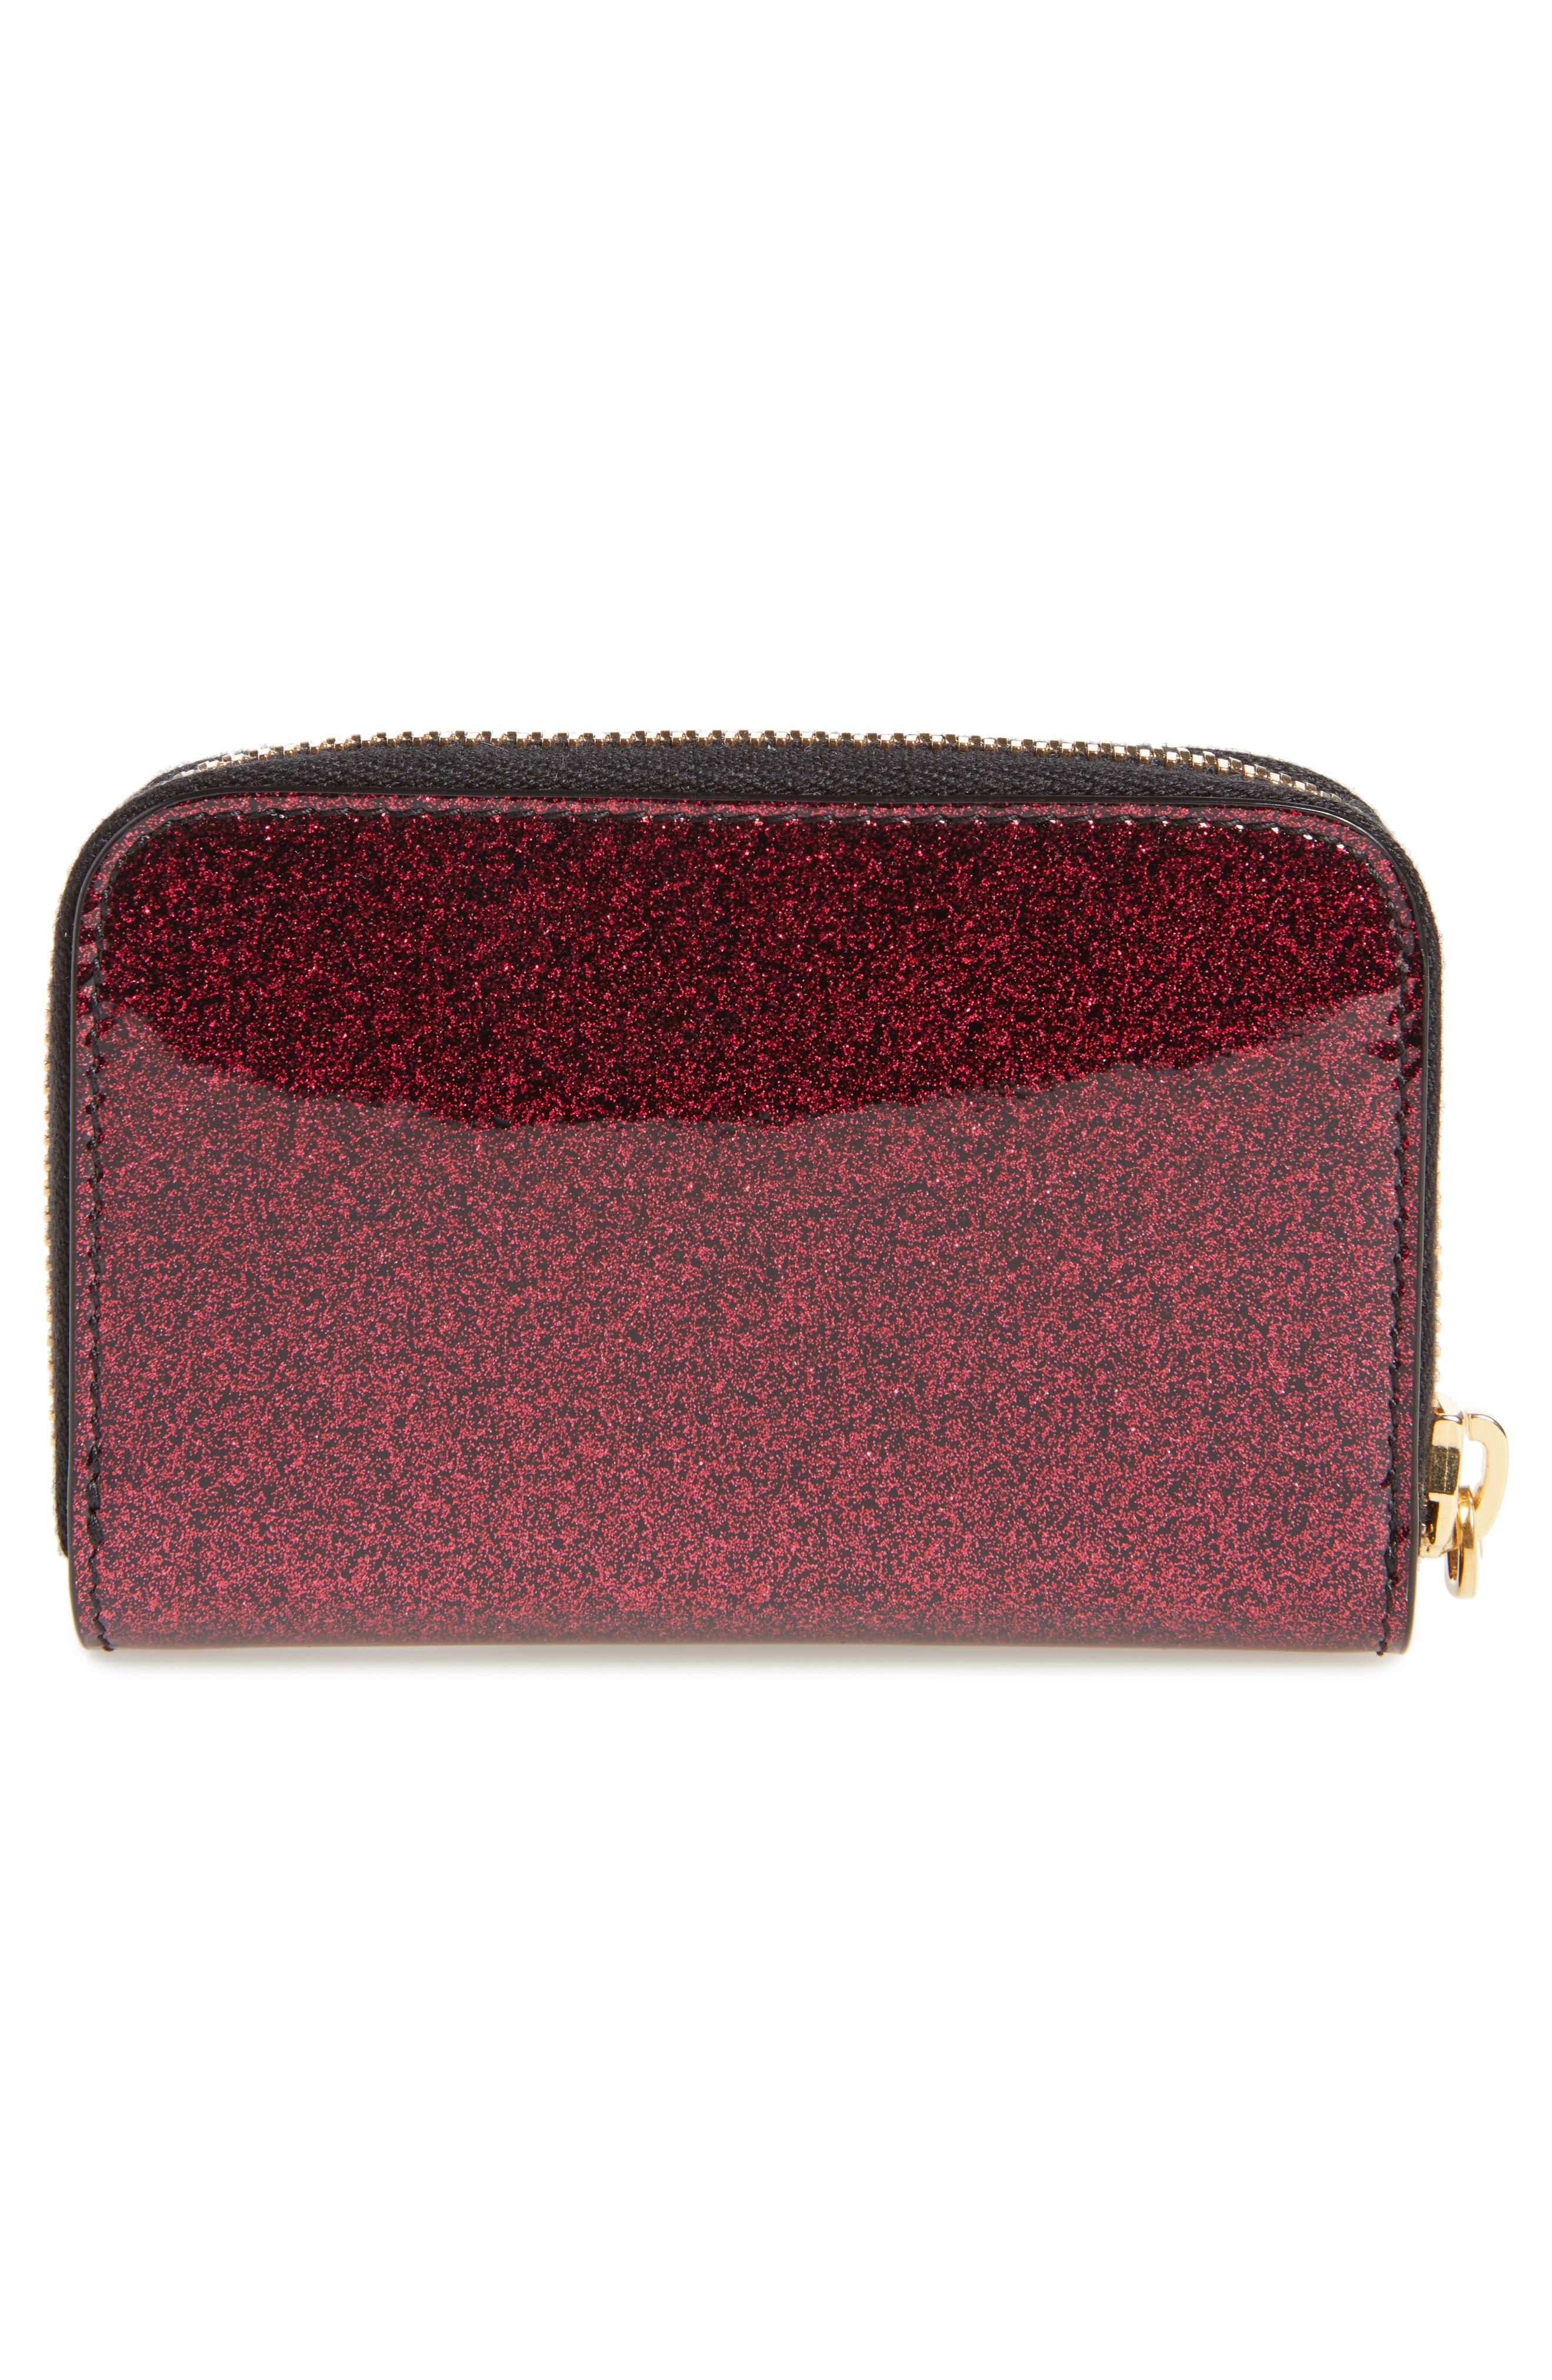 Glitter Calfskin Leather Wallet,                             Alternate thumbnail 4, color,                             SHOCKING PINK/ NOIR